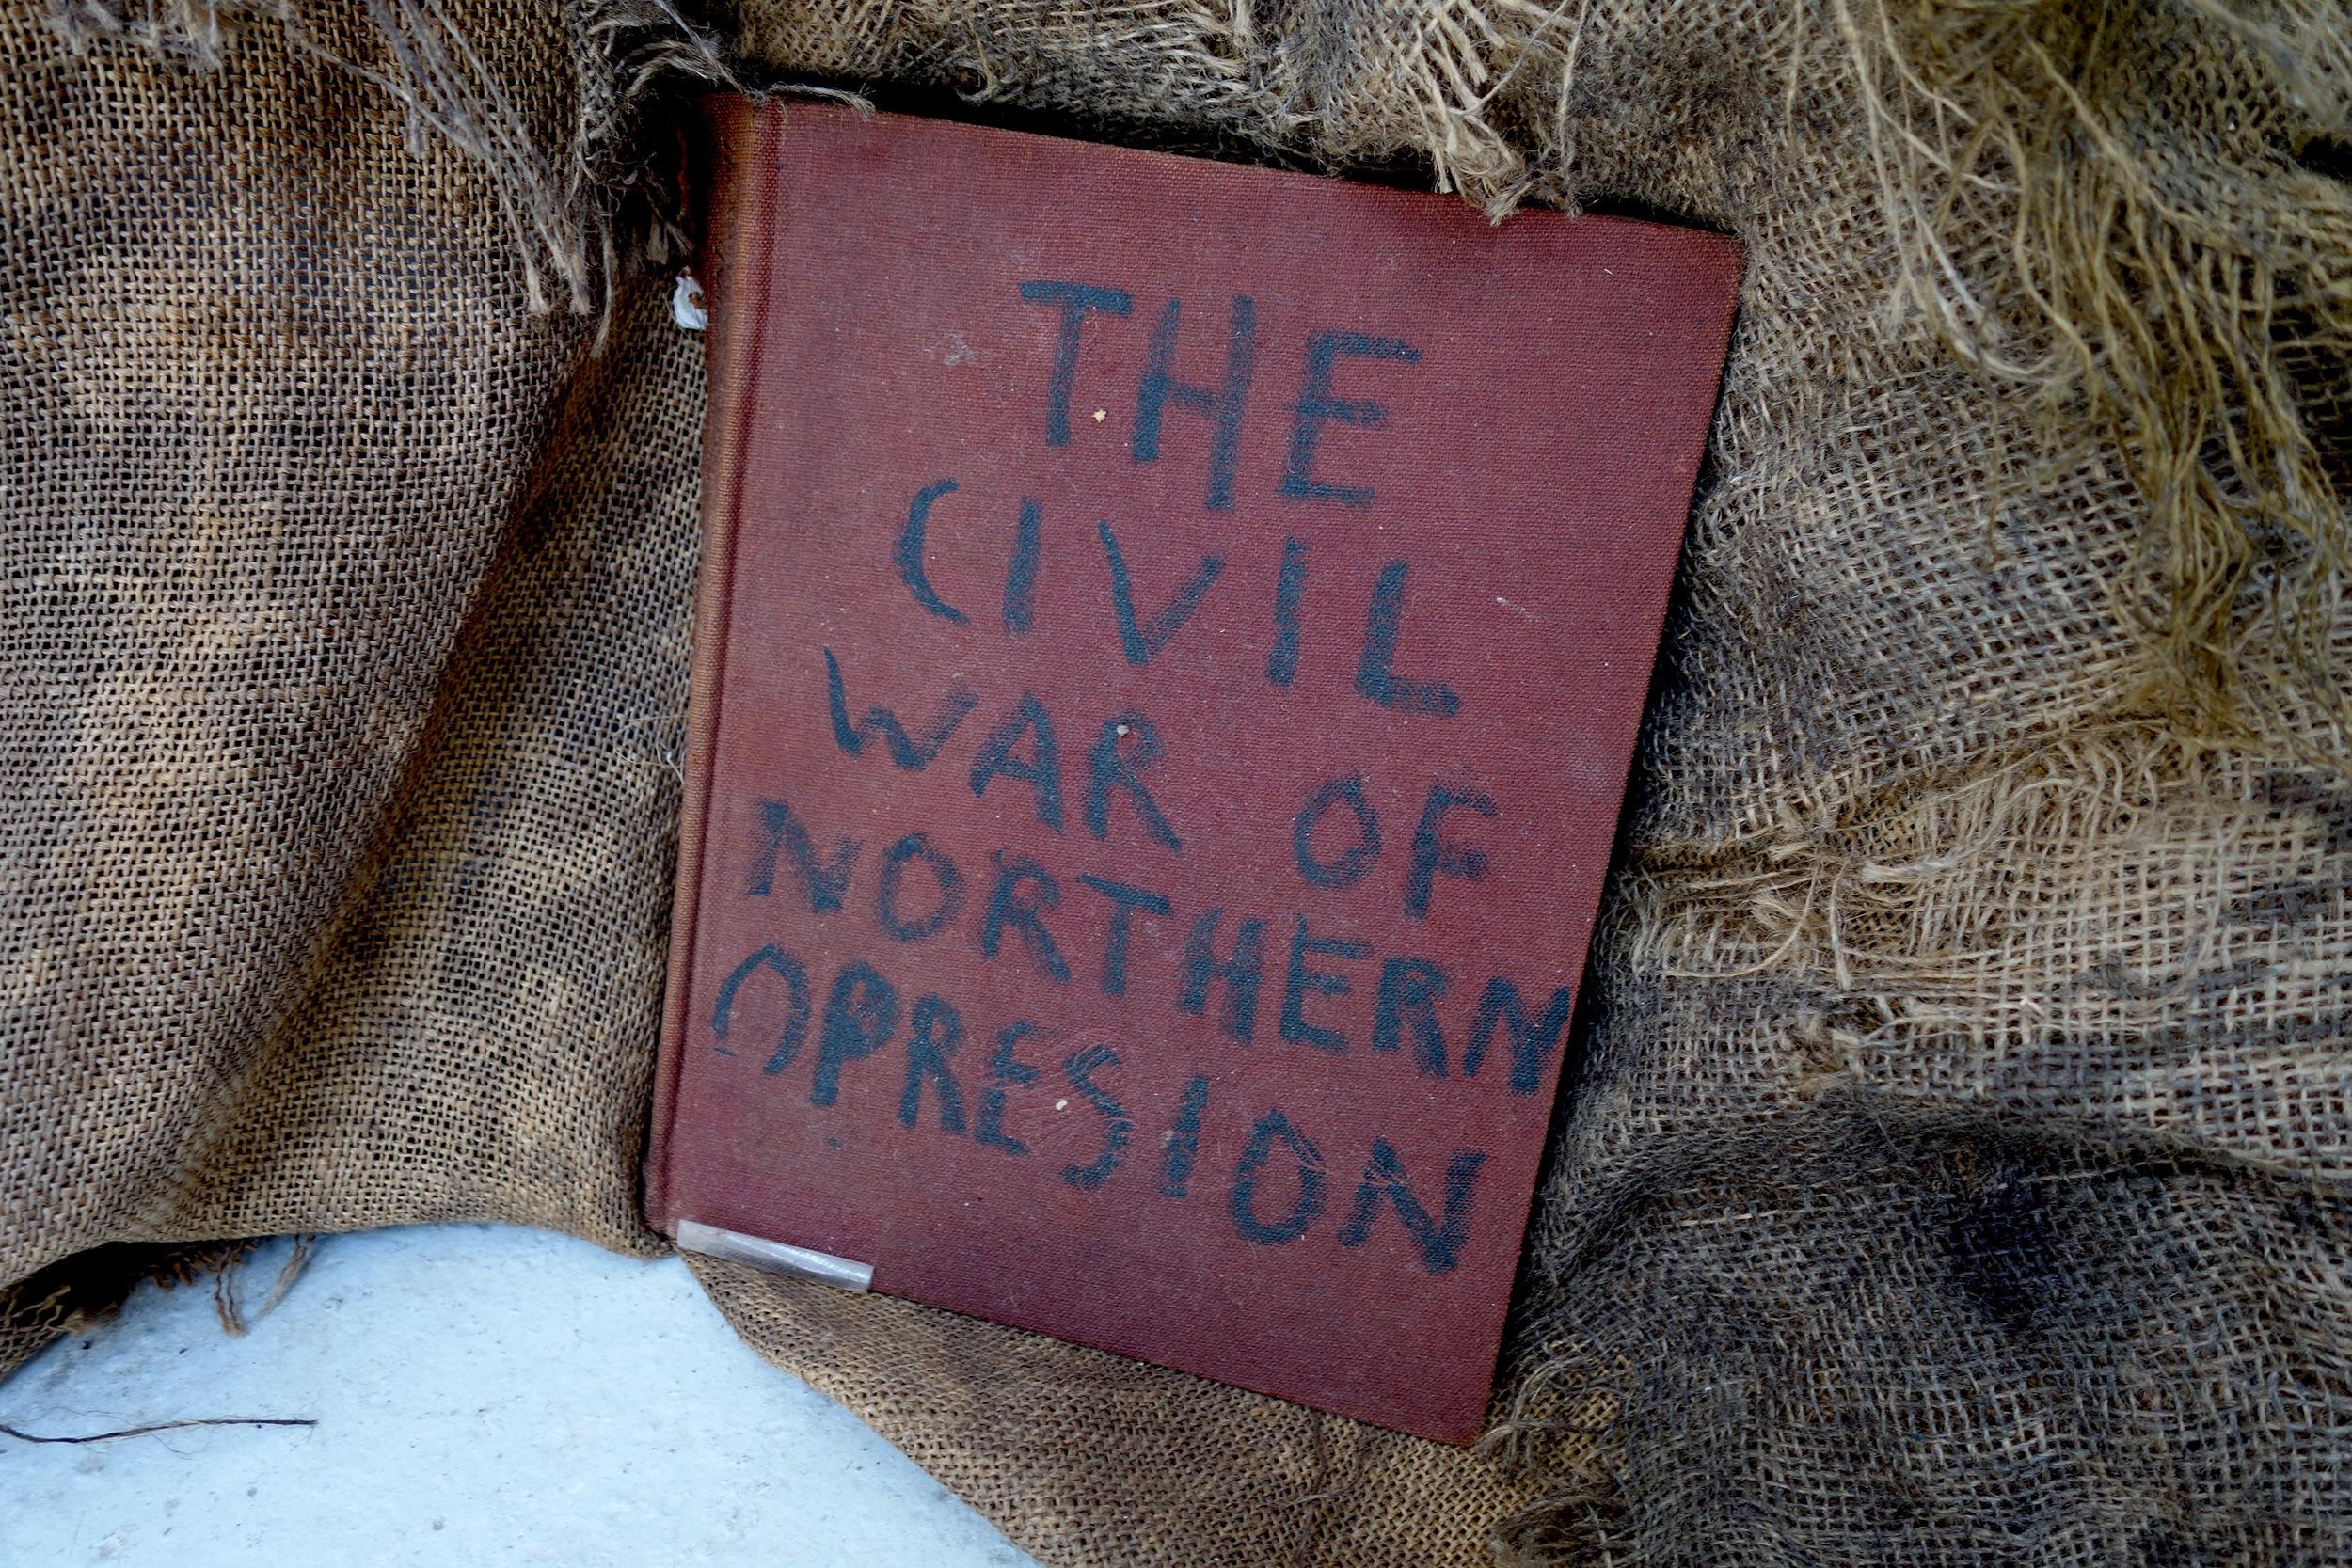 Civil War Of Northern Opresion.jpg